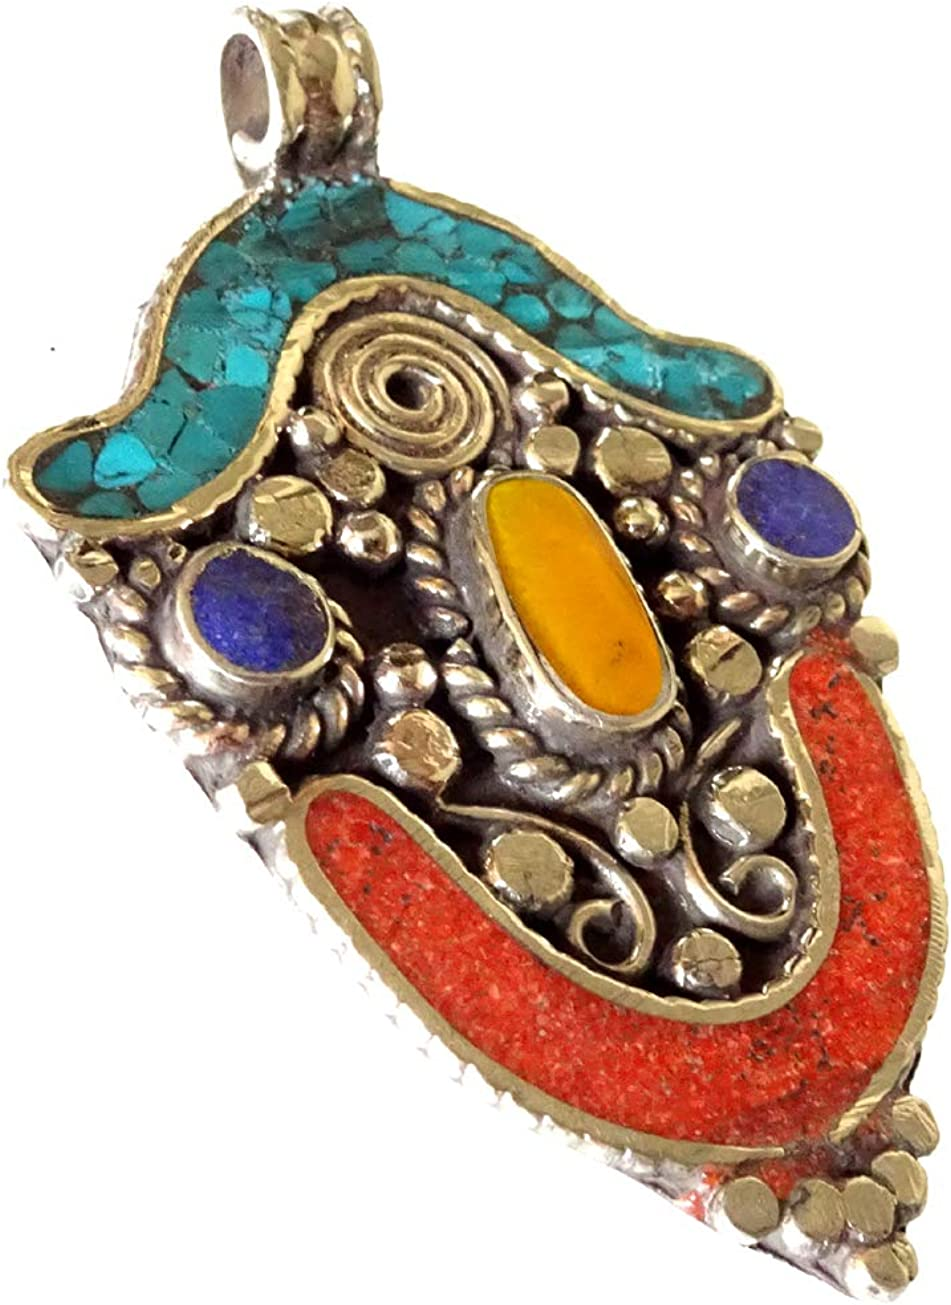 Bisutería de plata plateado colgante hecha a mano collar colgante filigrana étnica gitana auténtica turquesa Lapis Coral ámbar piedras preciosas amuleto curativo budista bohemio para mujeres